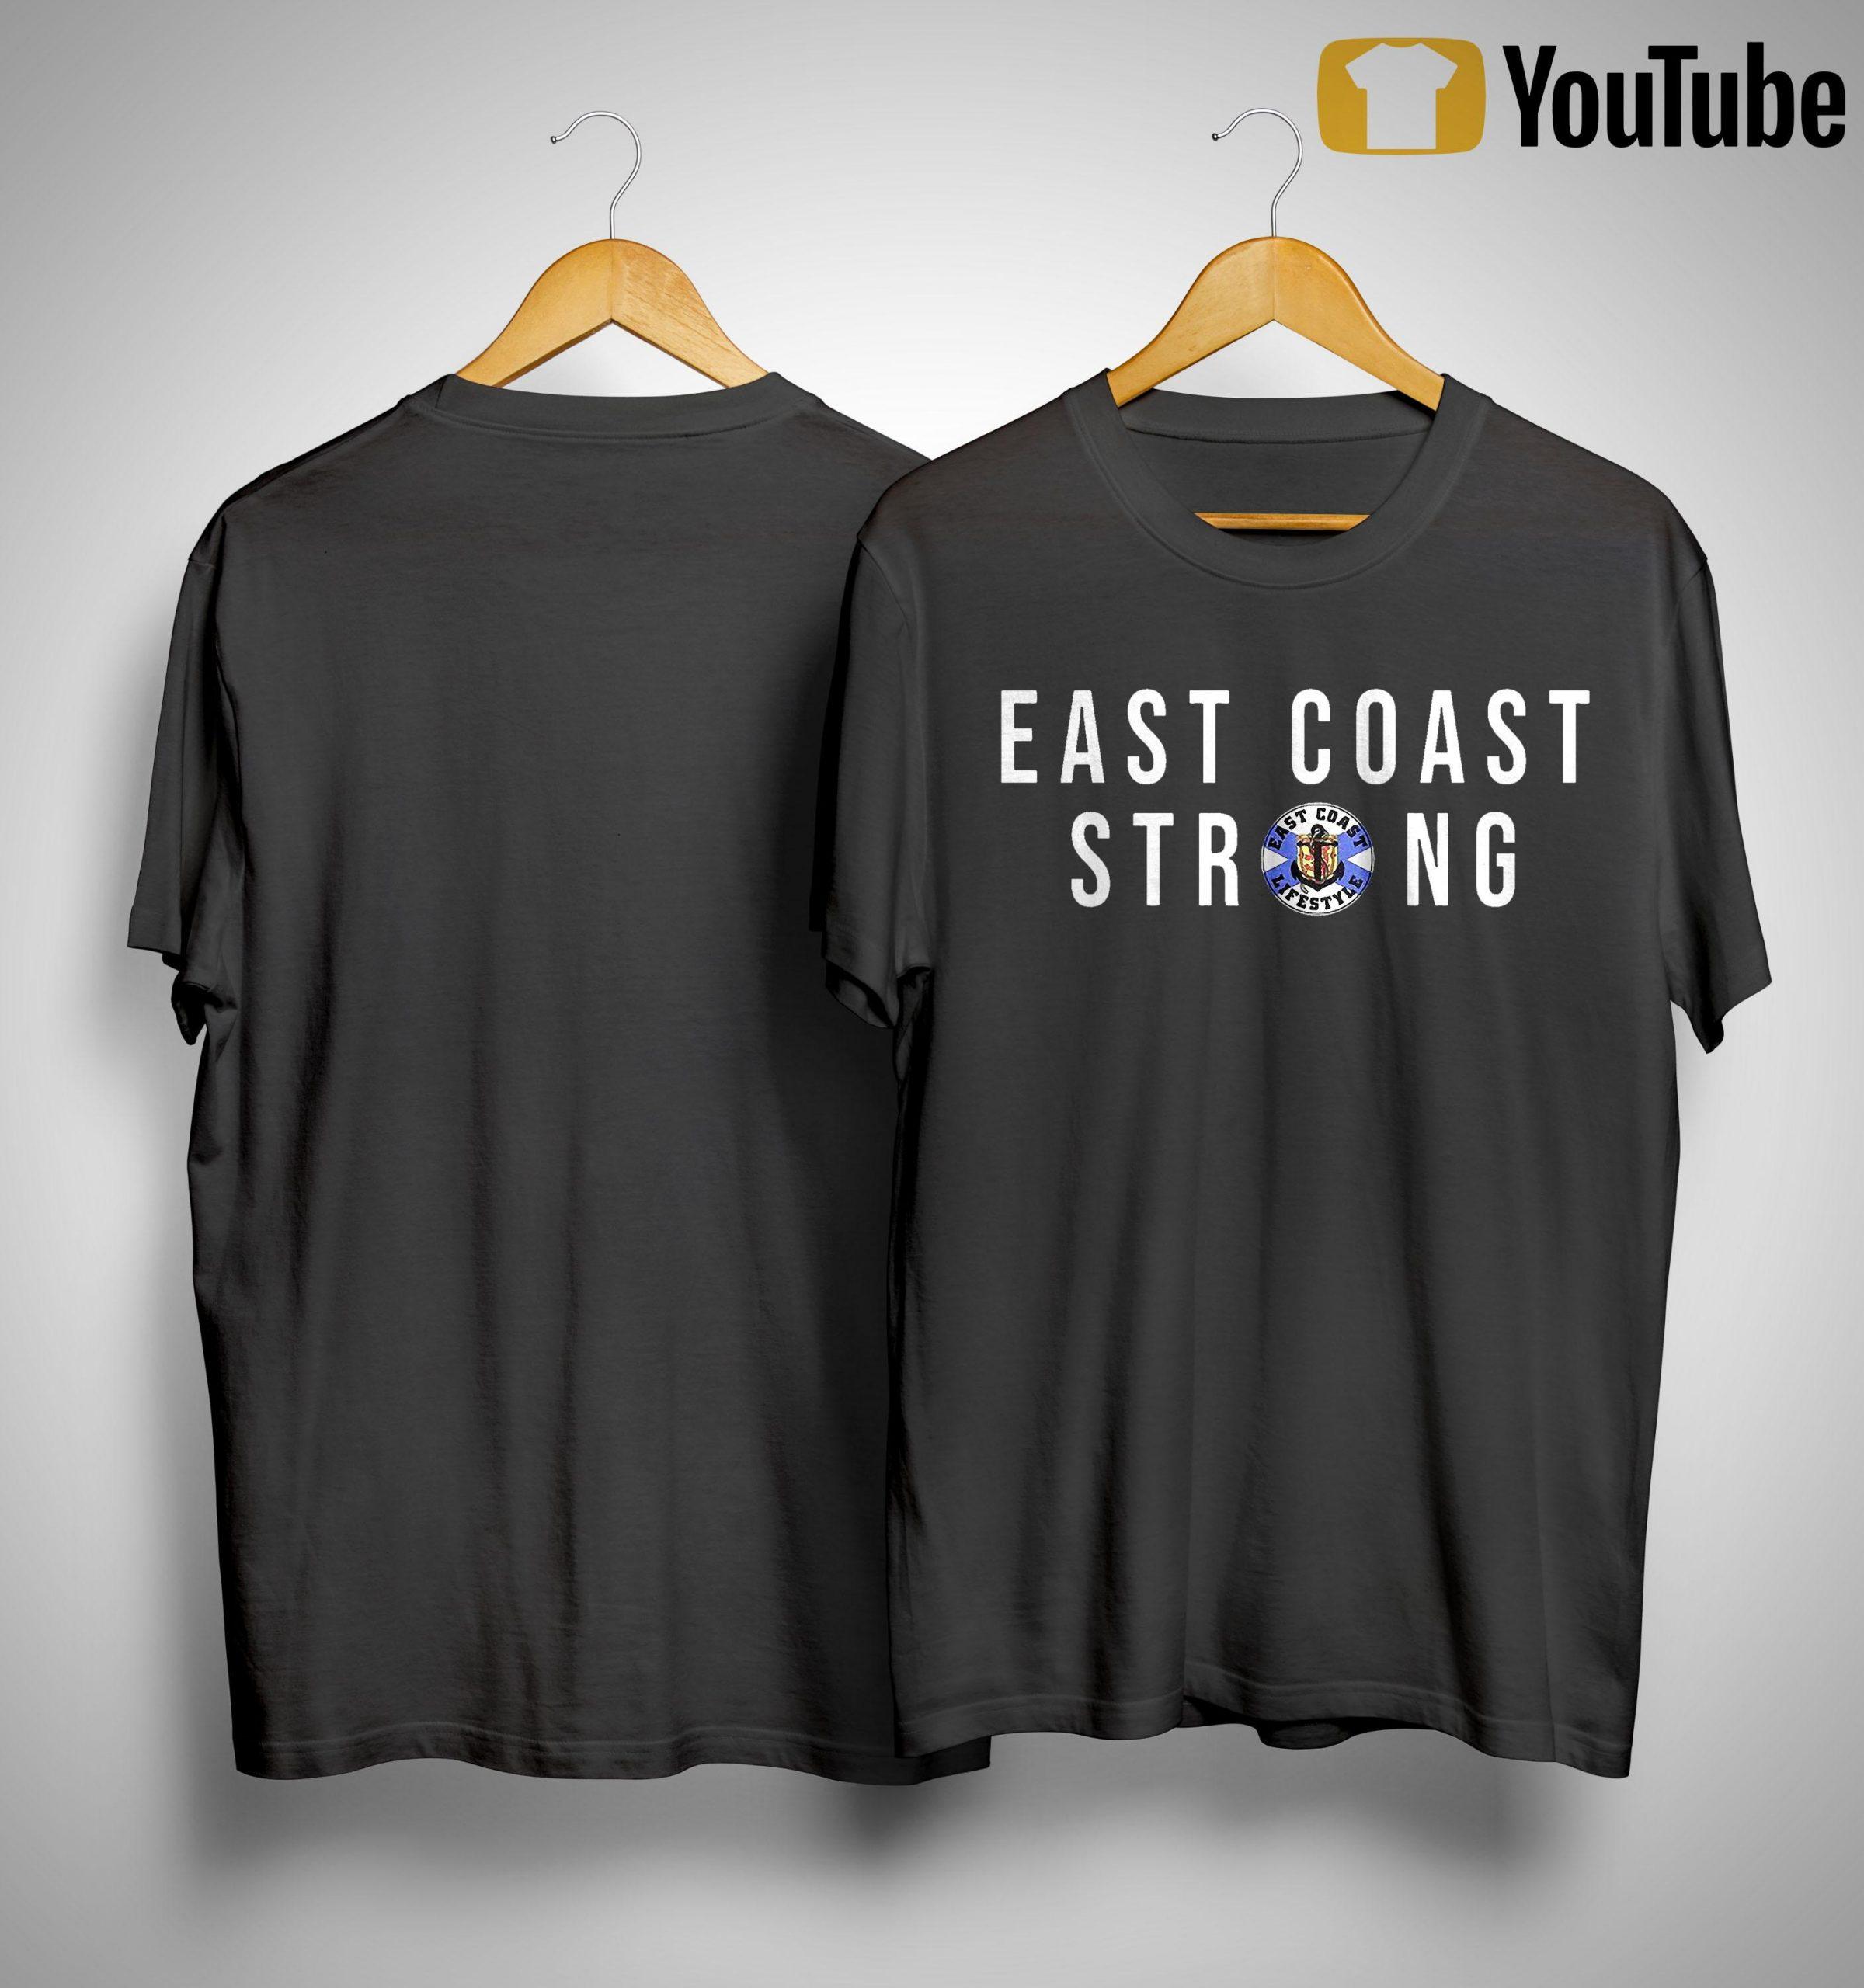 East Coast Lifestyle East Coast Strong Shirt